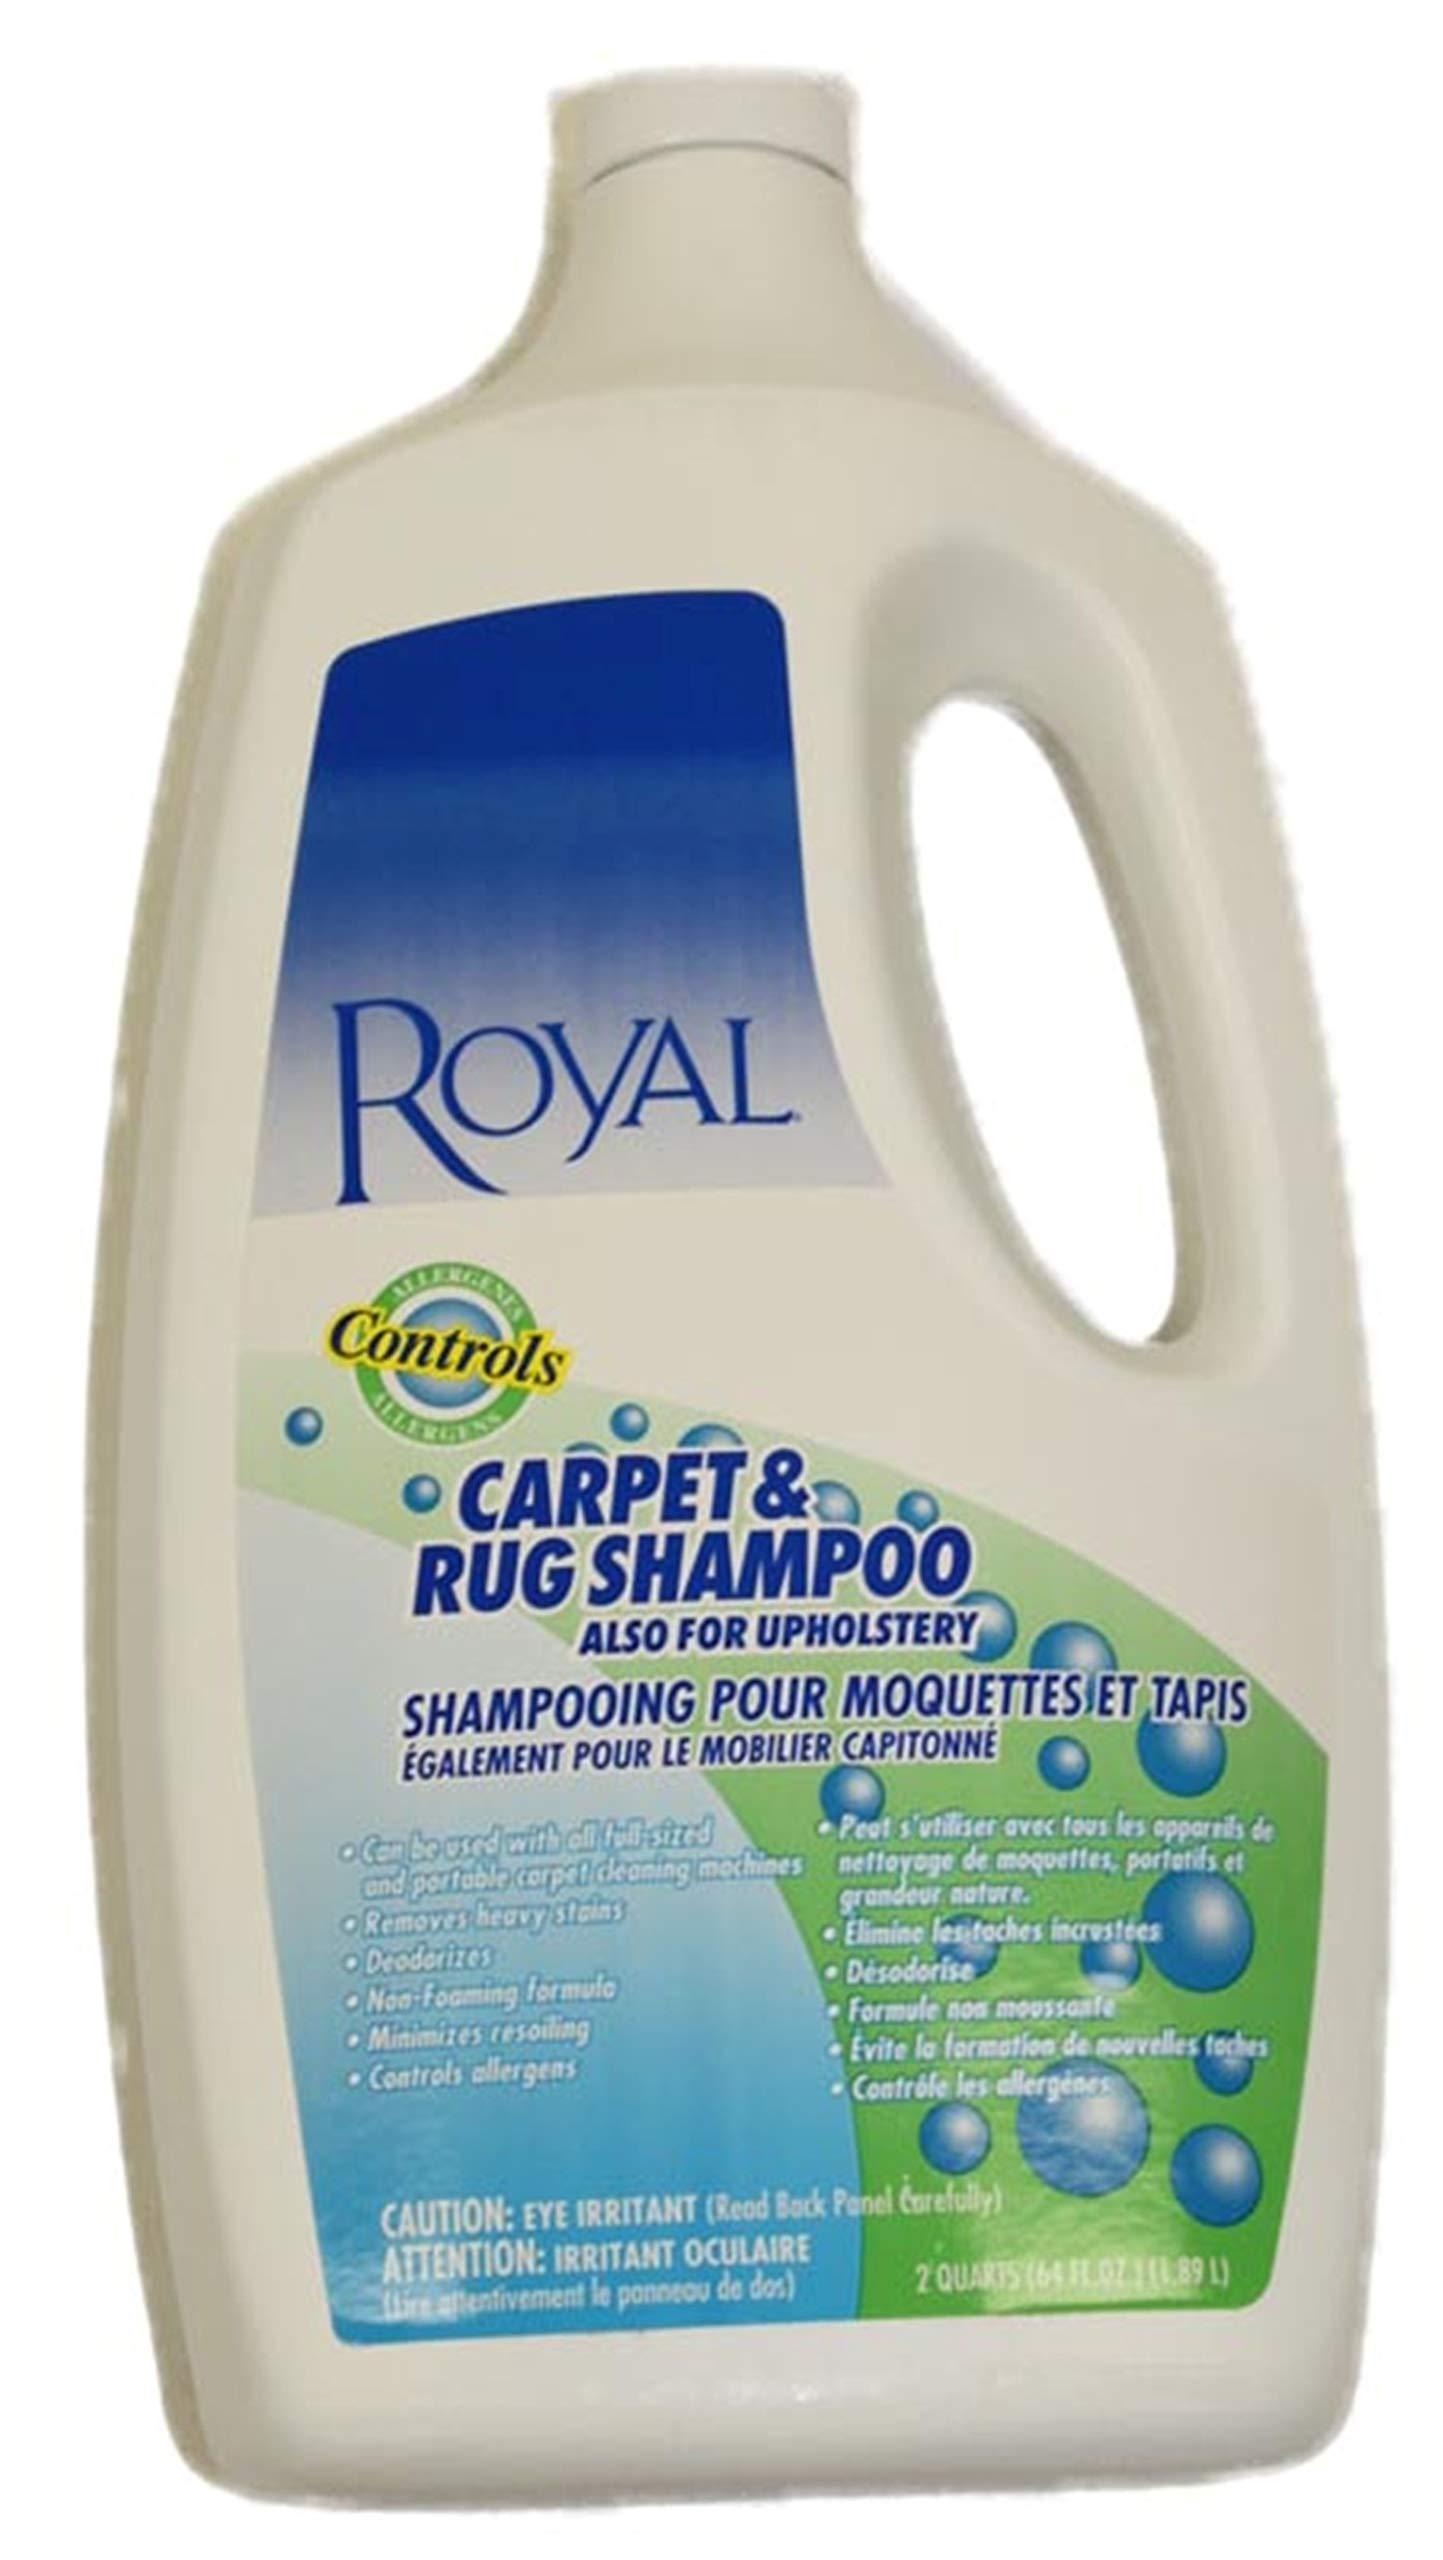 Royal Part#3115030001 - Genuine Royal Carpet and Rug Shampoo - 64 oz. by Royal